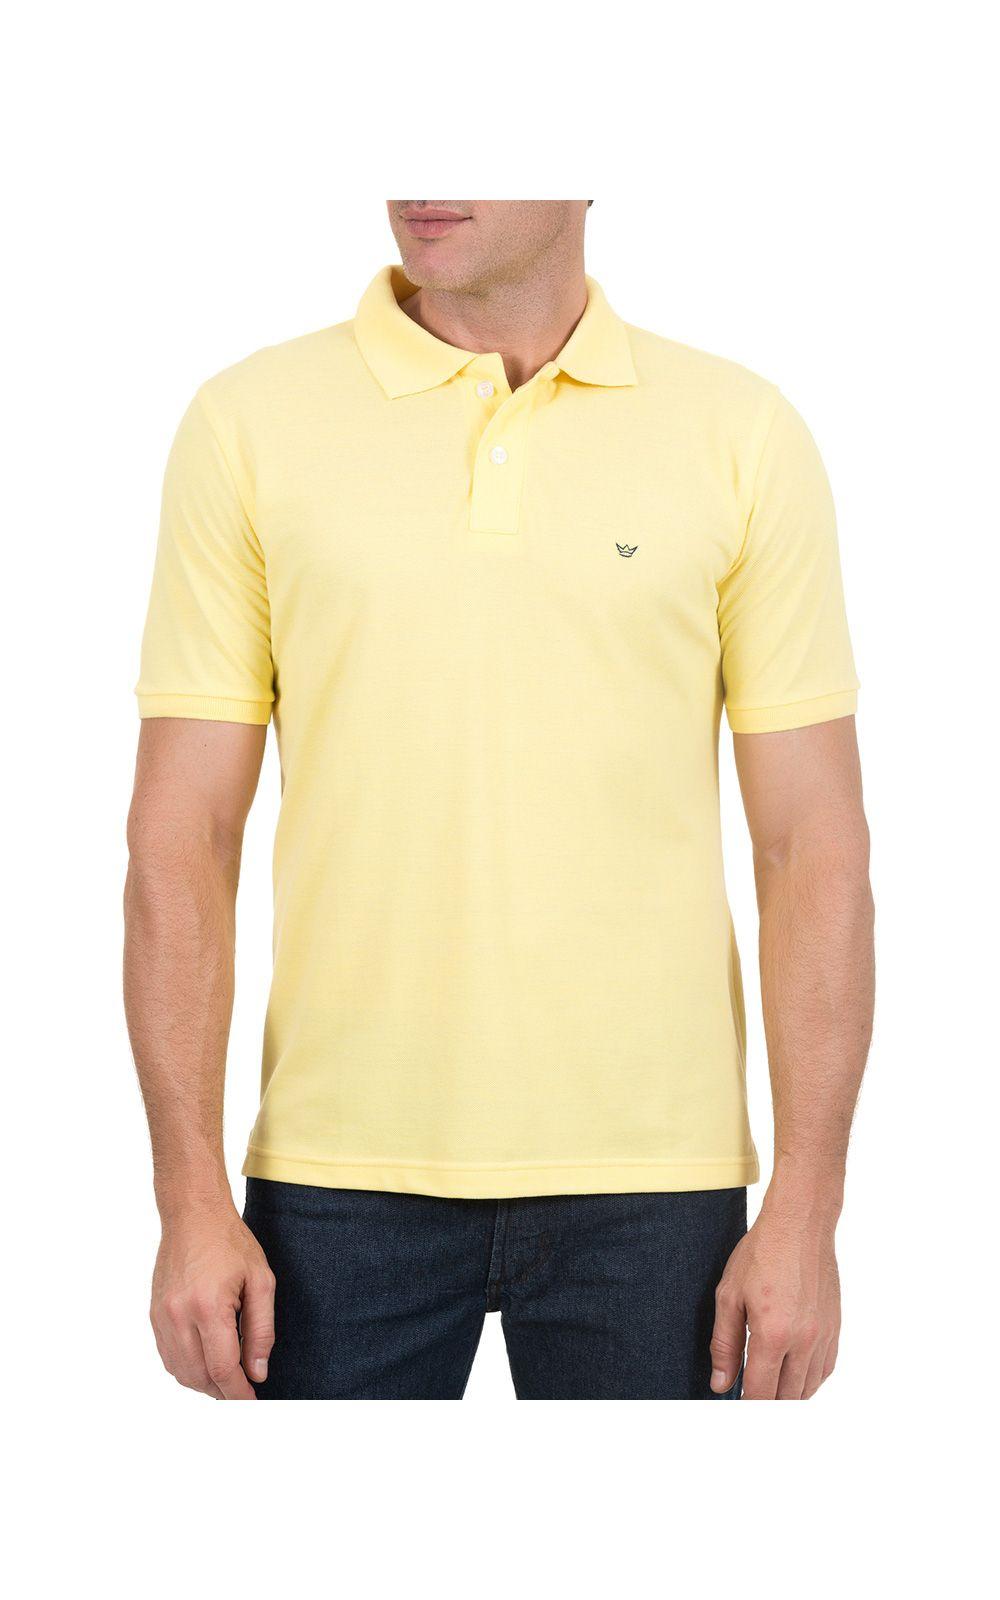 Foto 1 - Camisa Polo Masculina Amarela Lisa